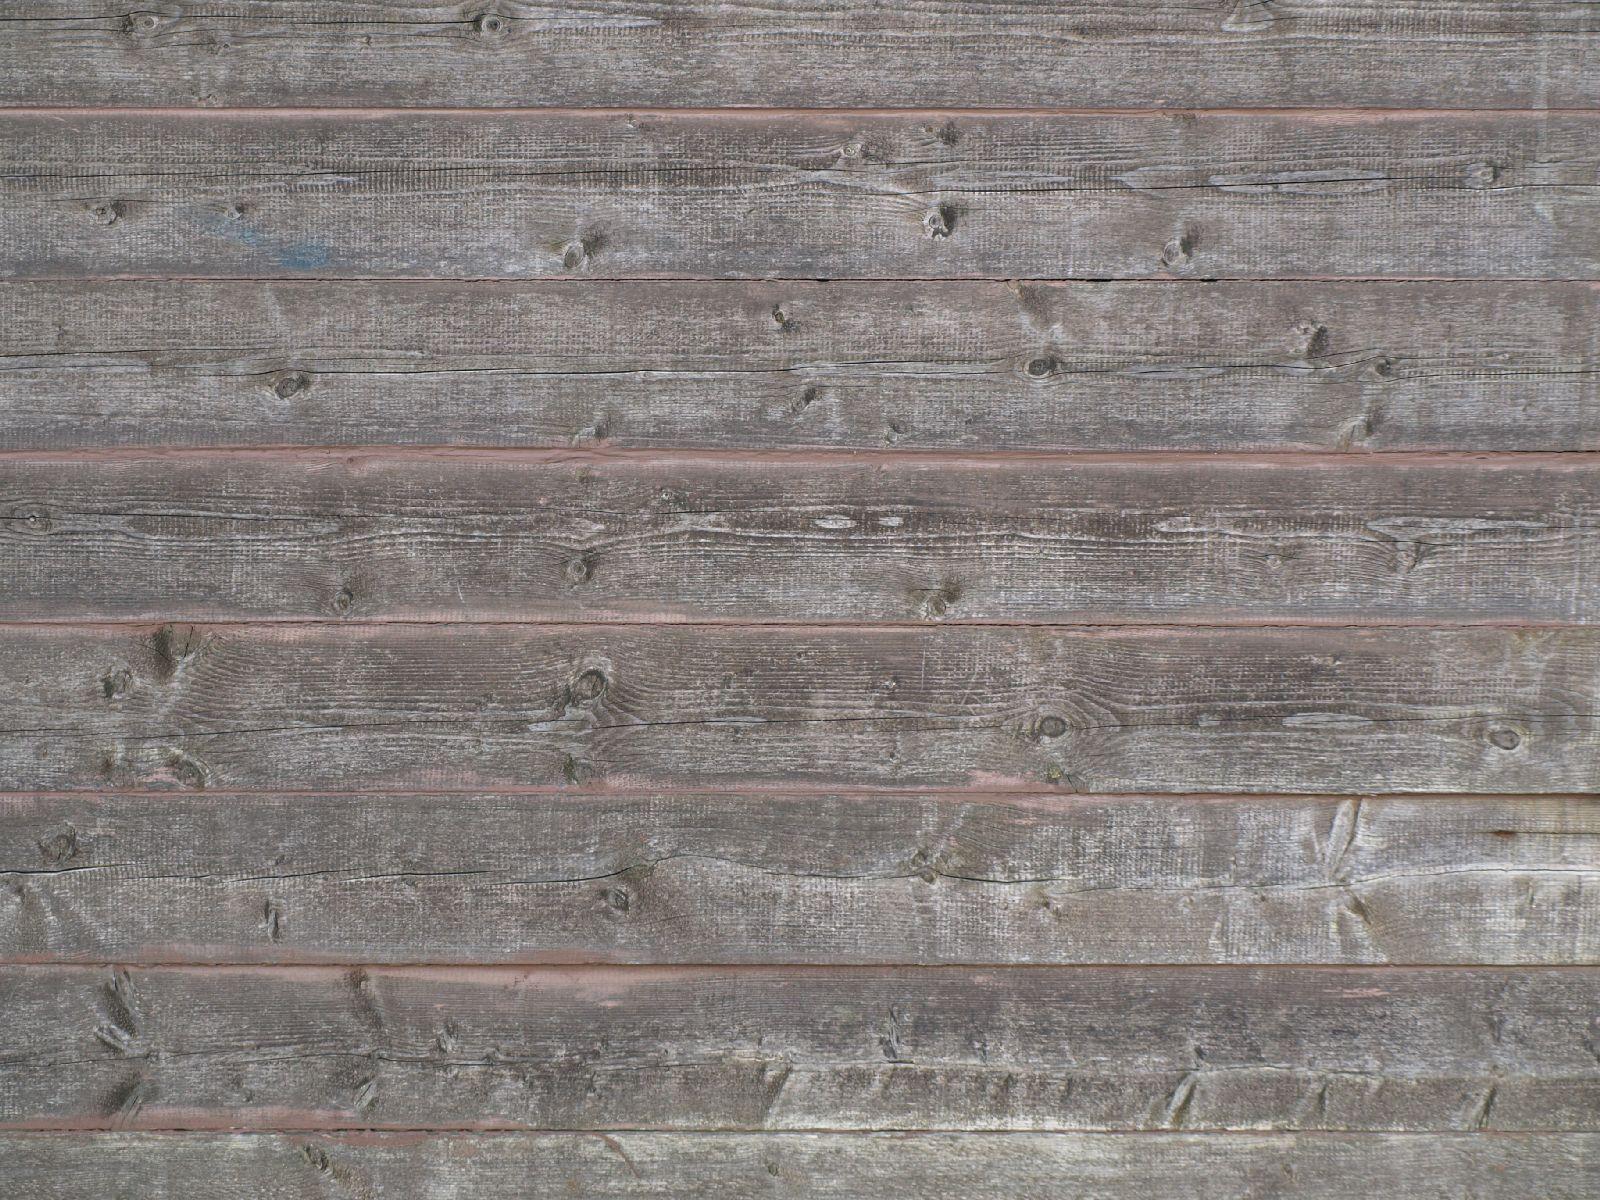 Wood_Texture_A_P4120937